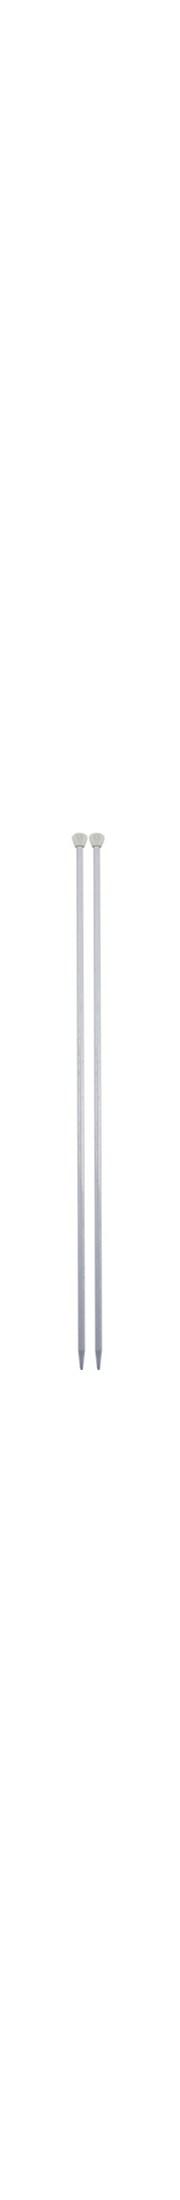 Agulha Para Tricô - 4,5mm - 100% Alumínio - 35cm - Nacional - Círculo